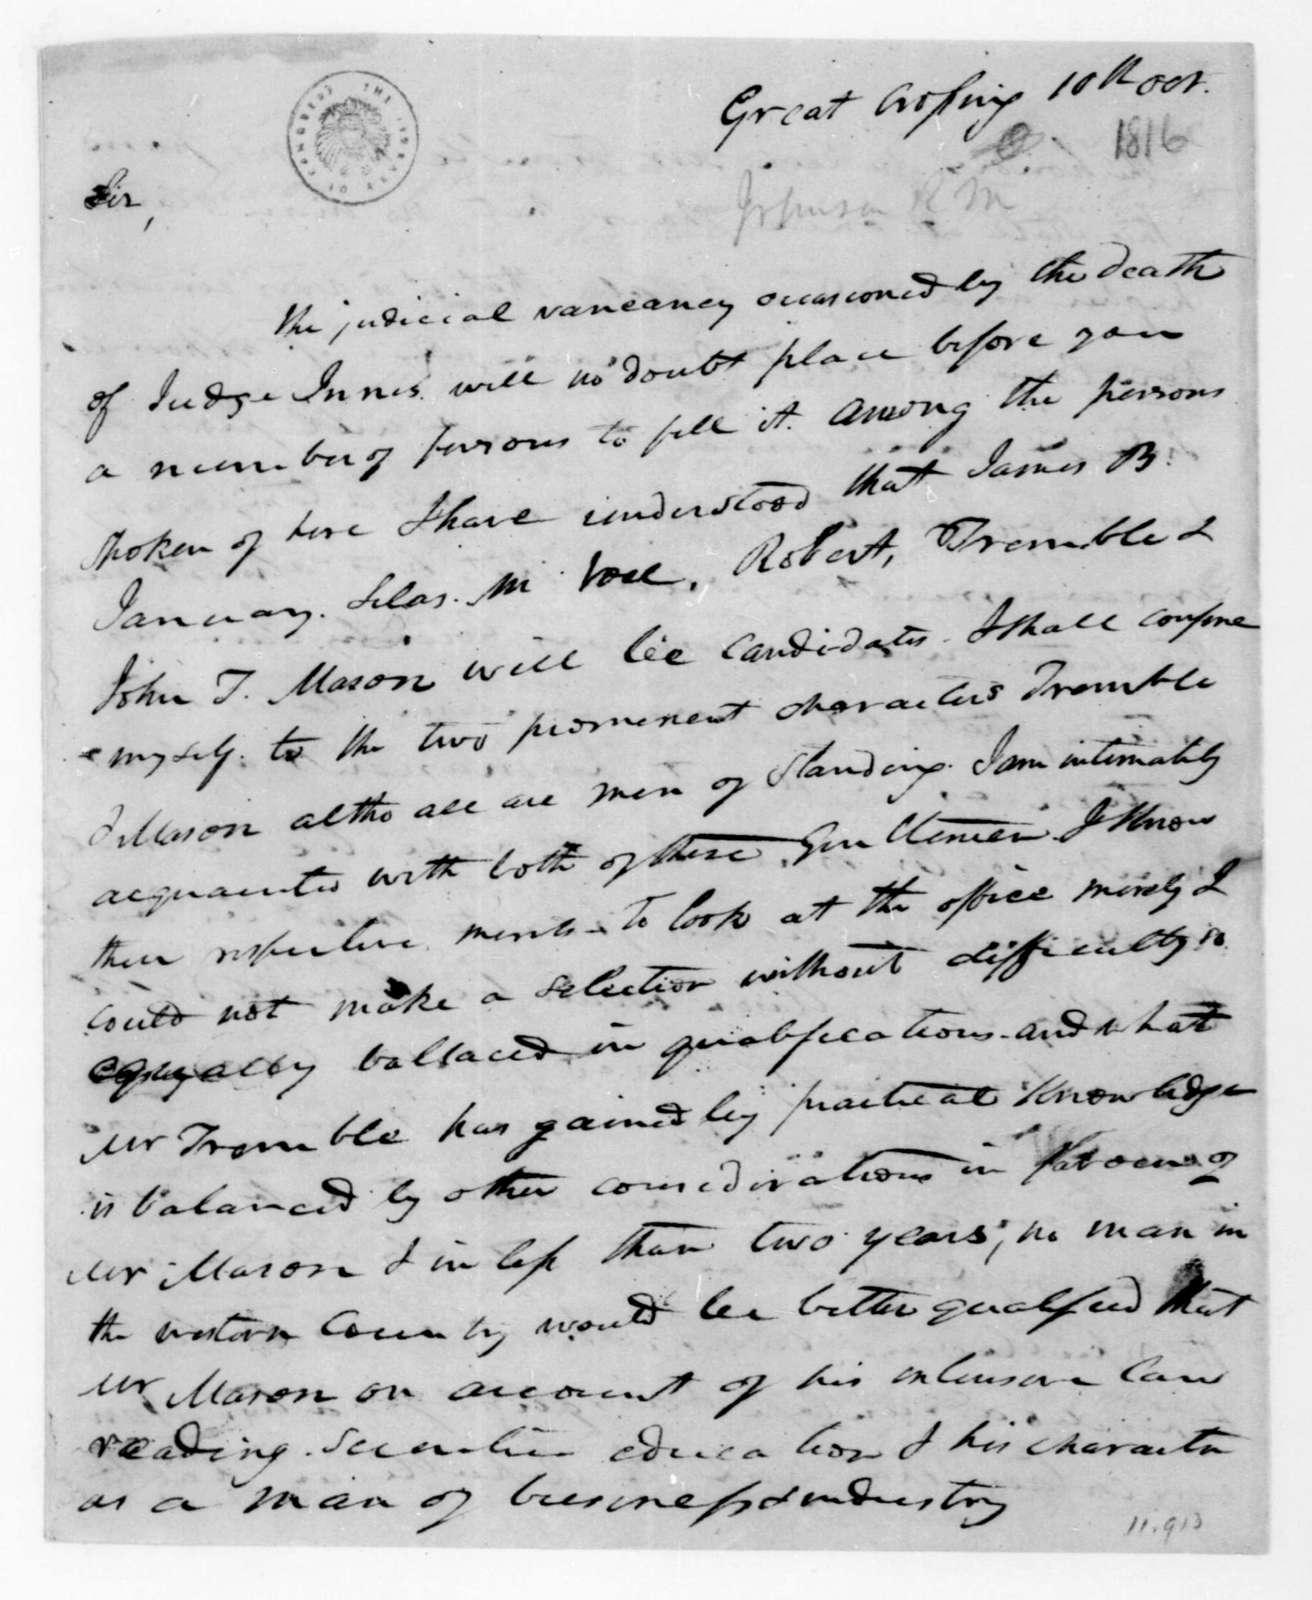 Richard M. Johnson to James Madison, October 10, 1816.